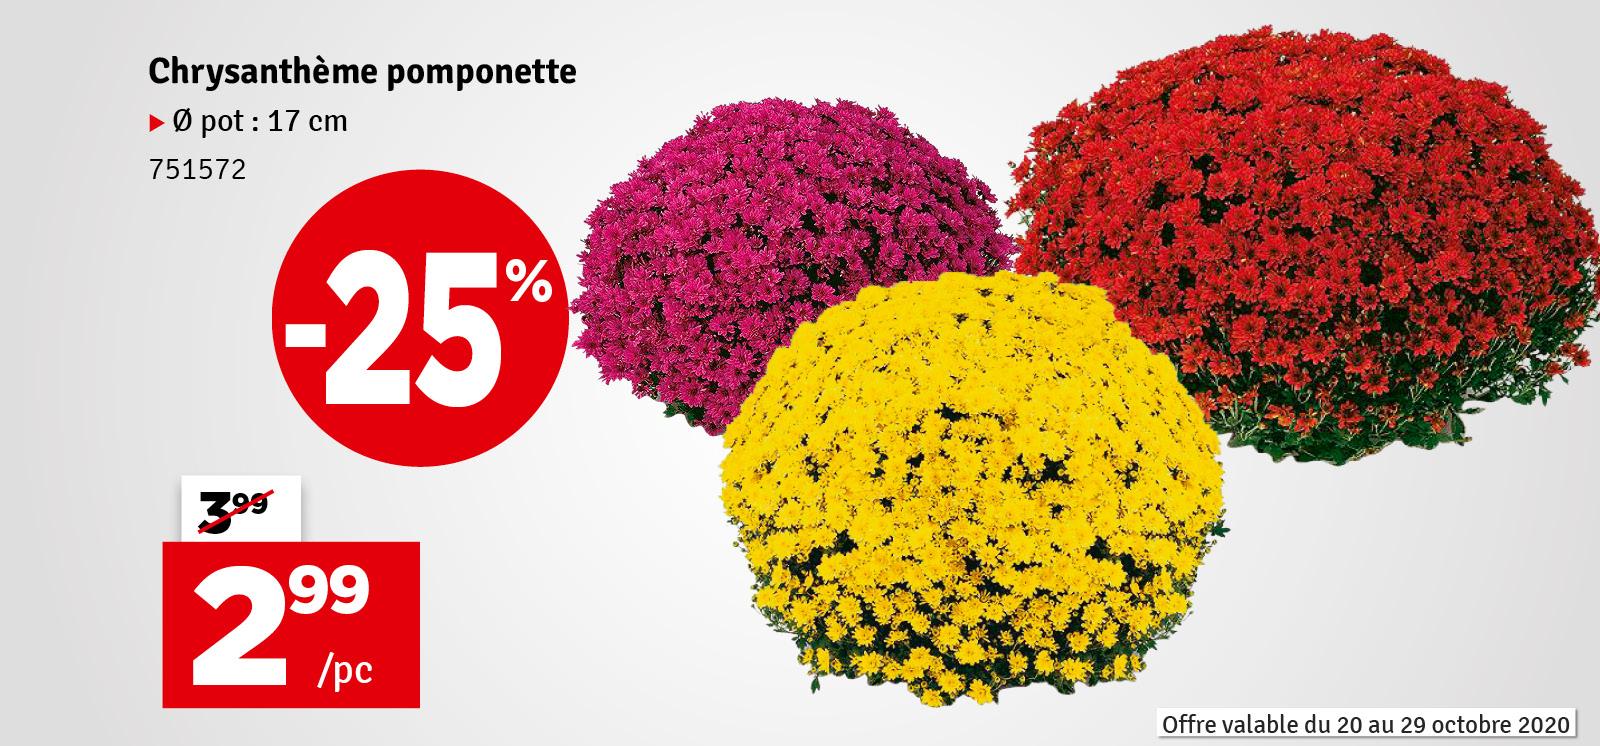 Promo - Chrysanthème pomponette en pot